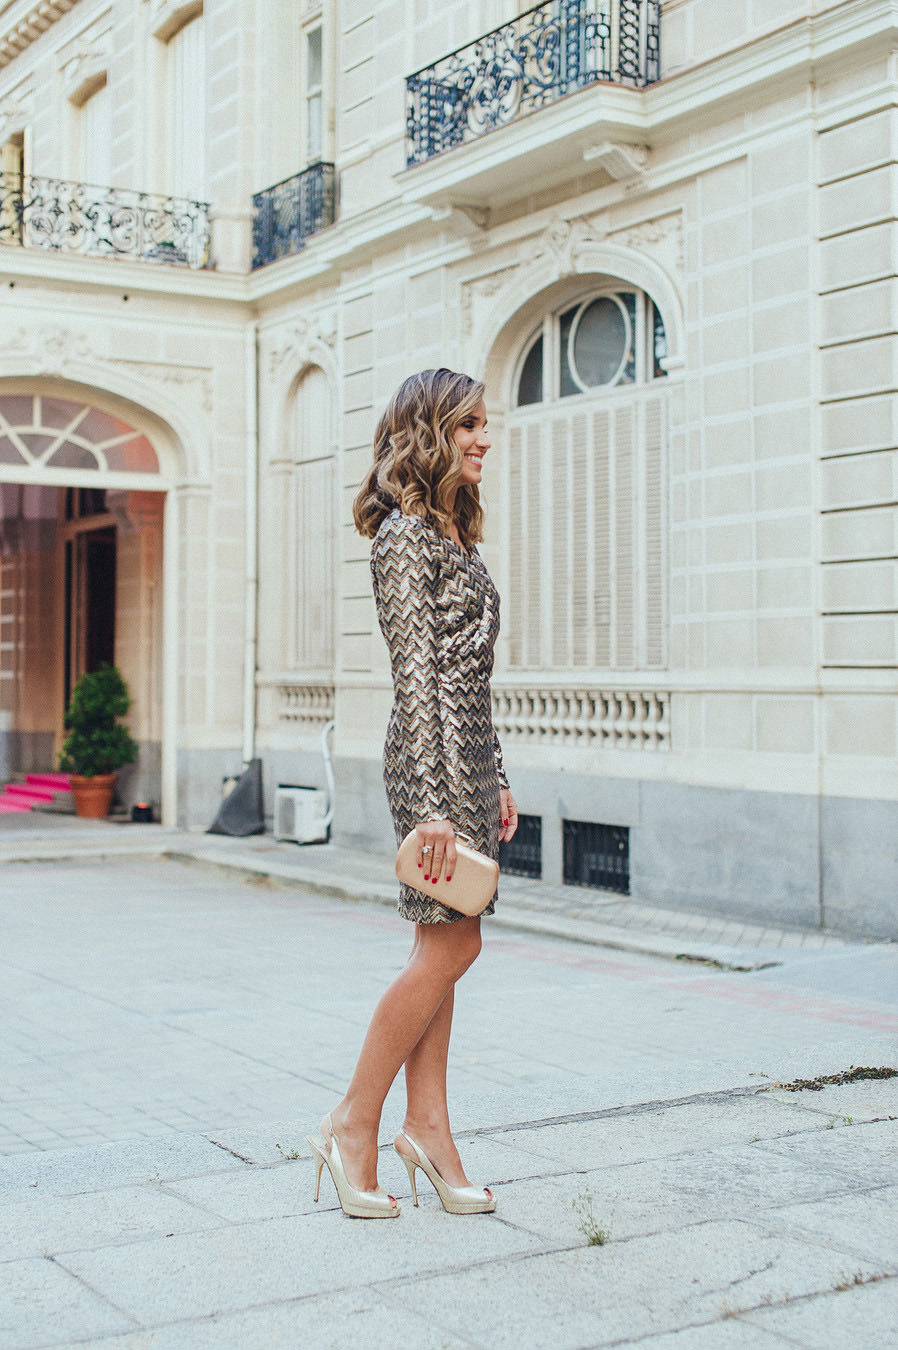 calista-one-lista-de-bodas-online-blog-de-bodas-bossanova-looks-invitadas-jeremy-sanders-7